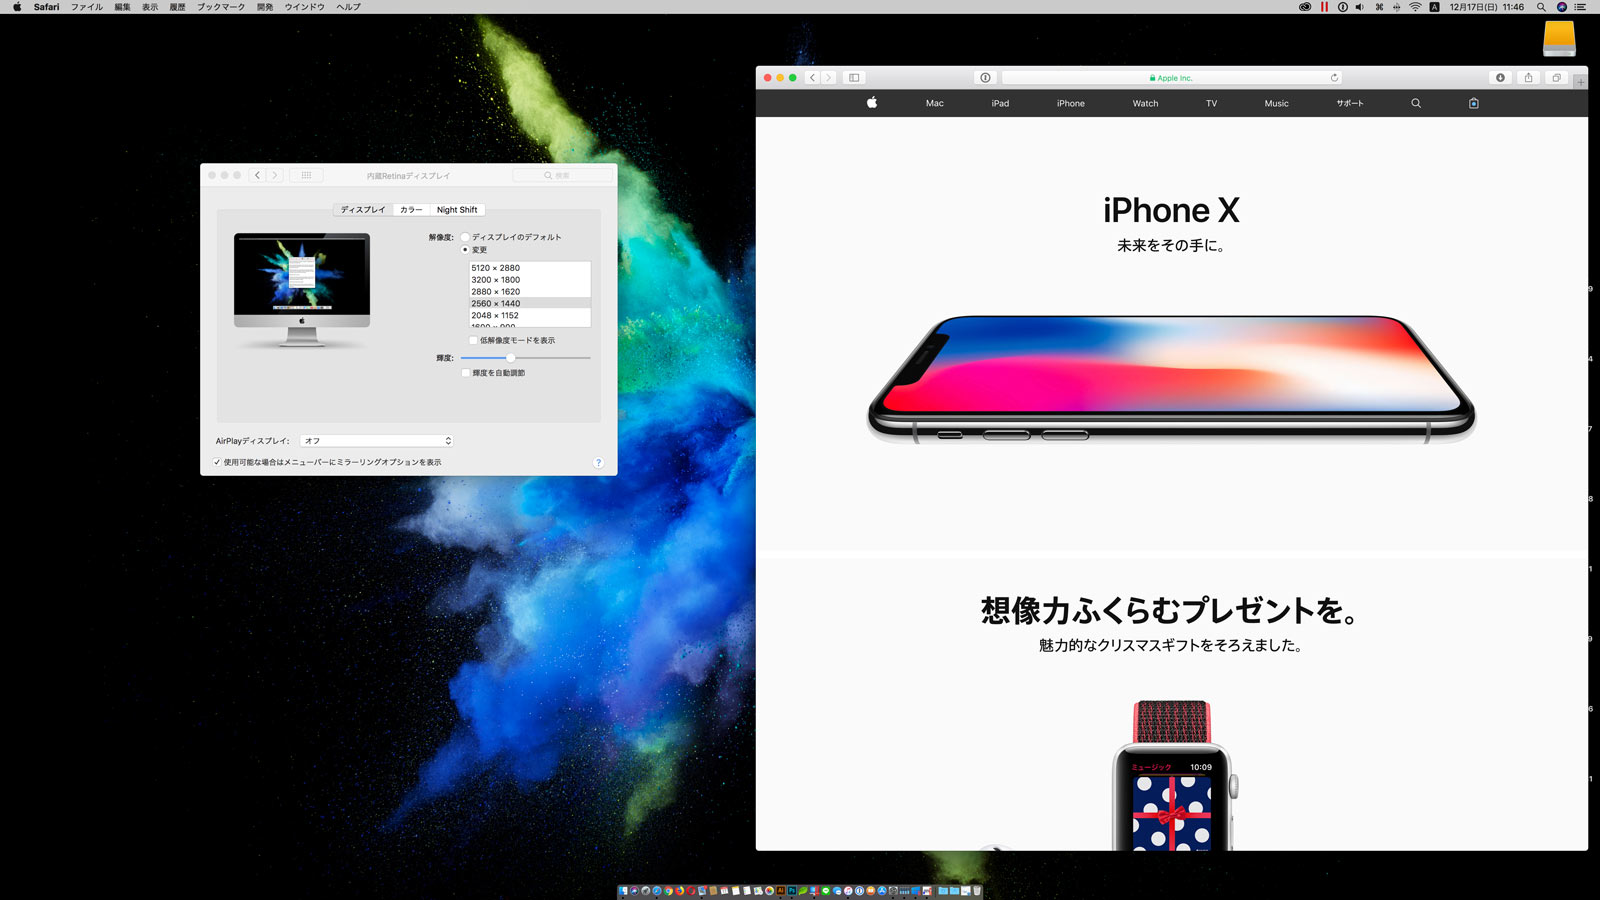 iMac 5K 解像度変更